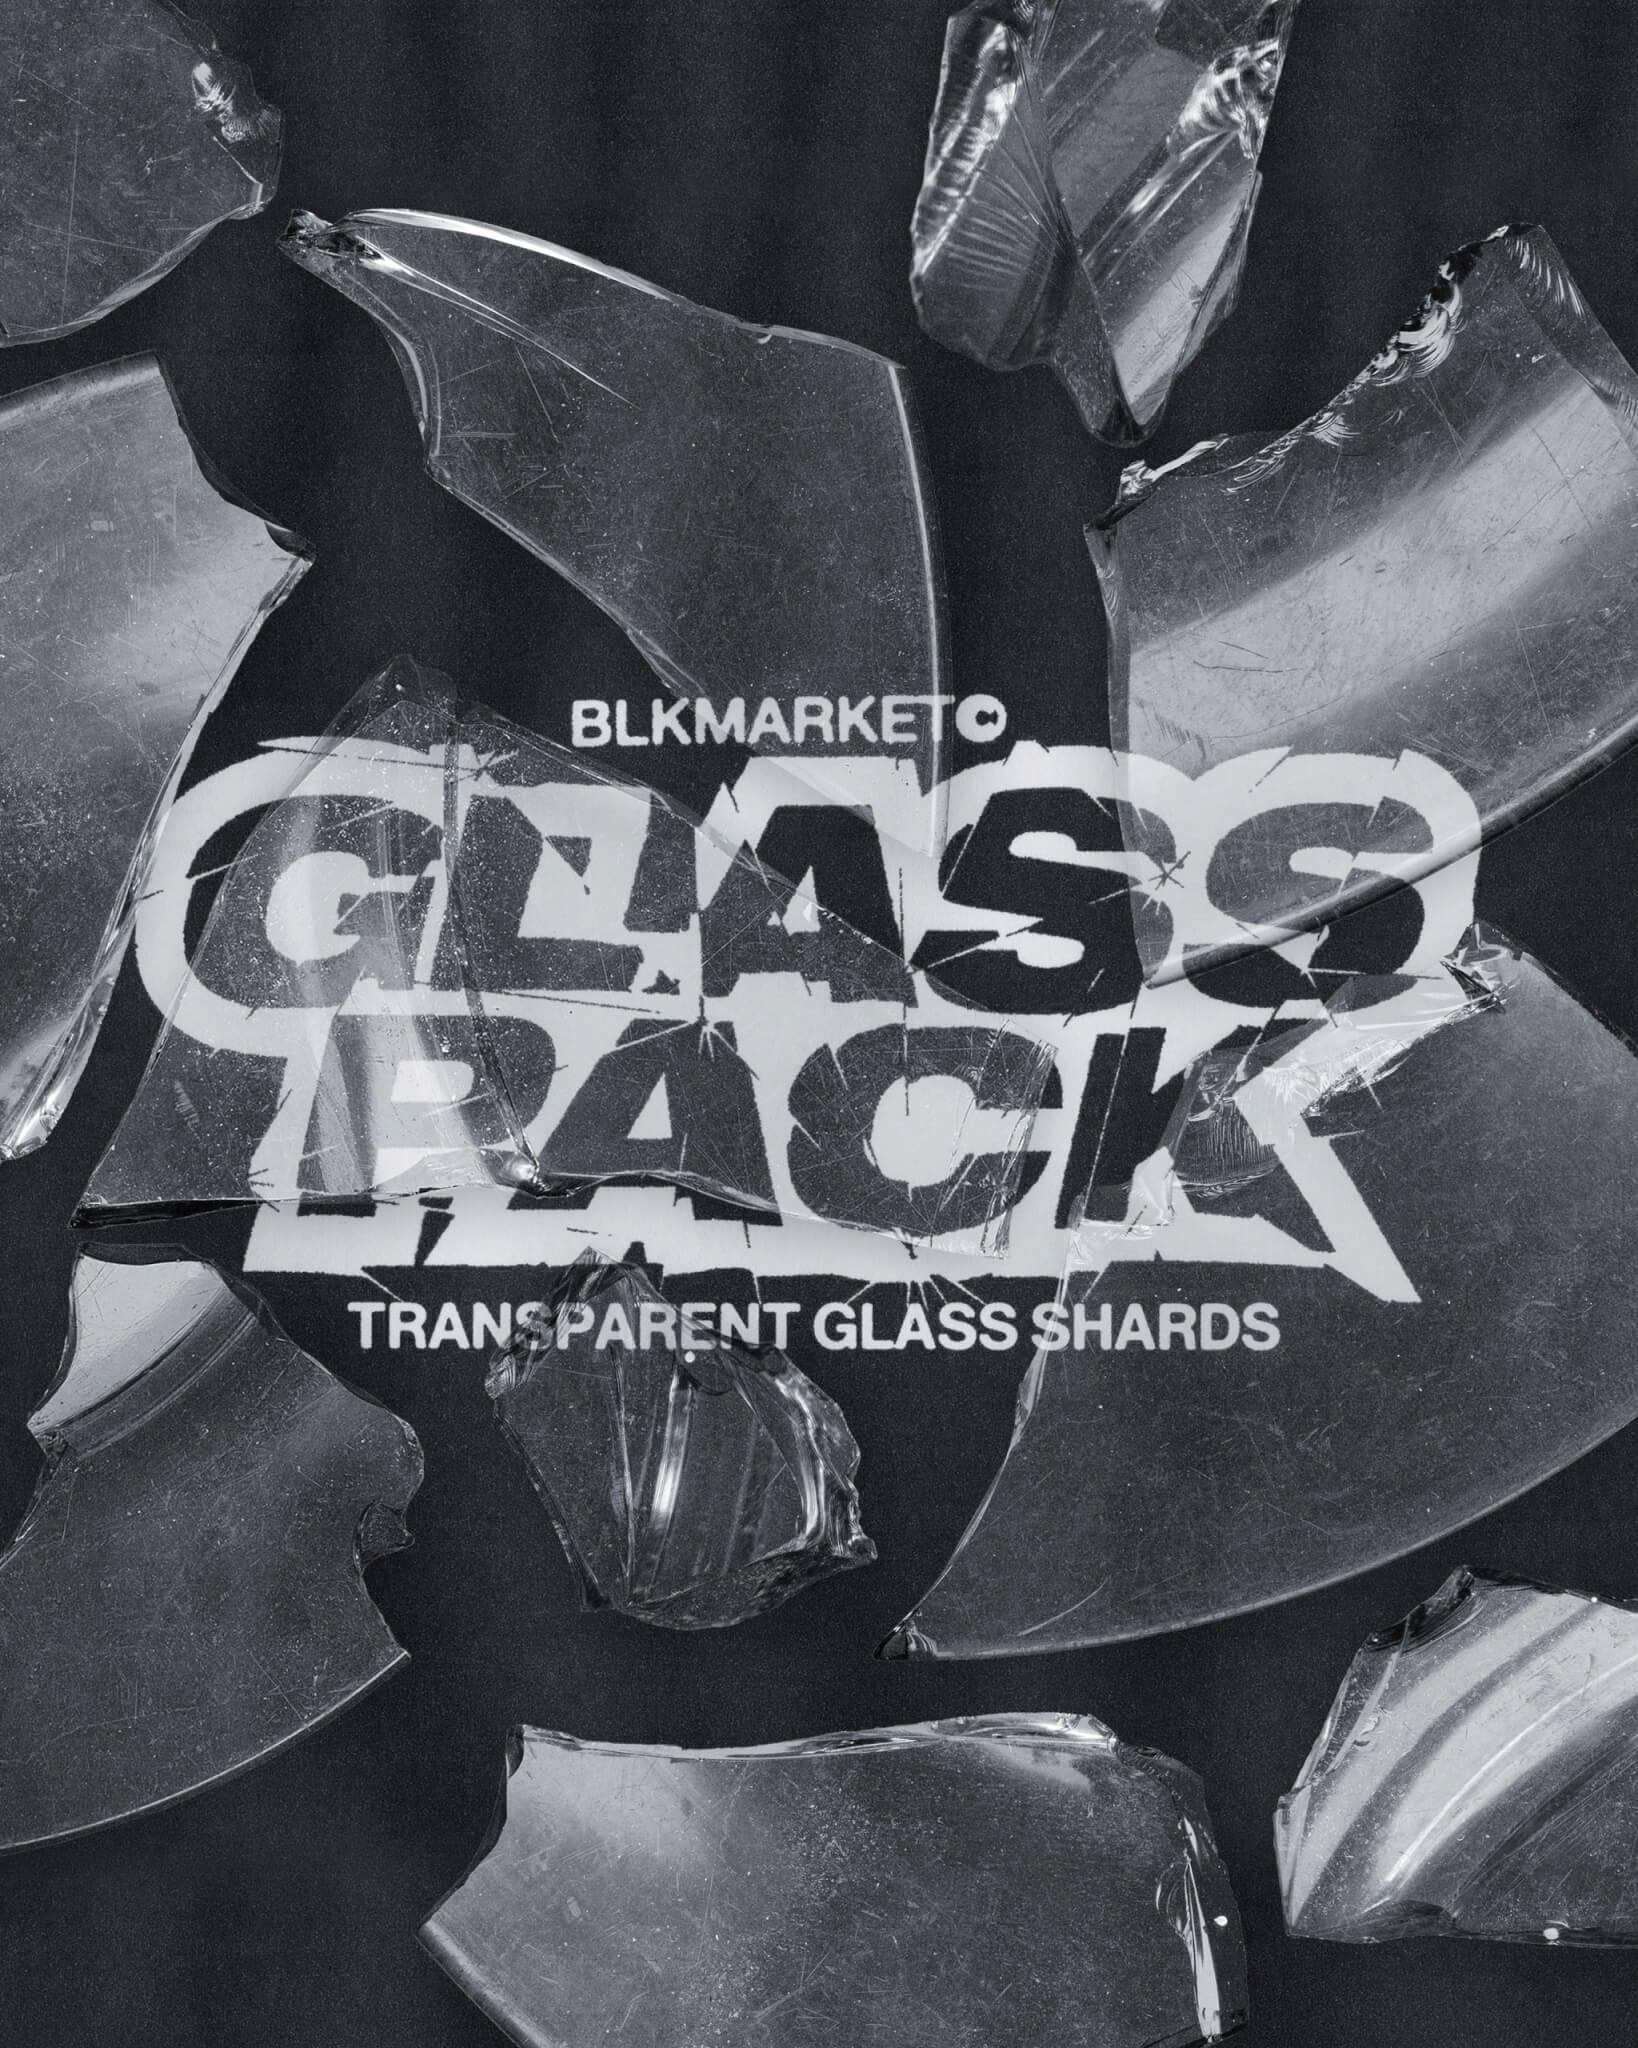 GLASSPACK